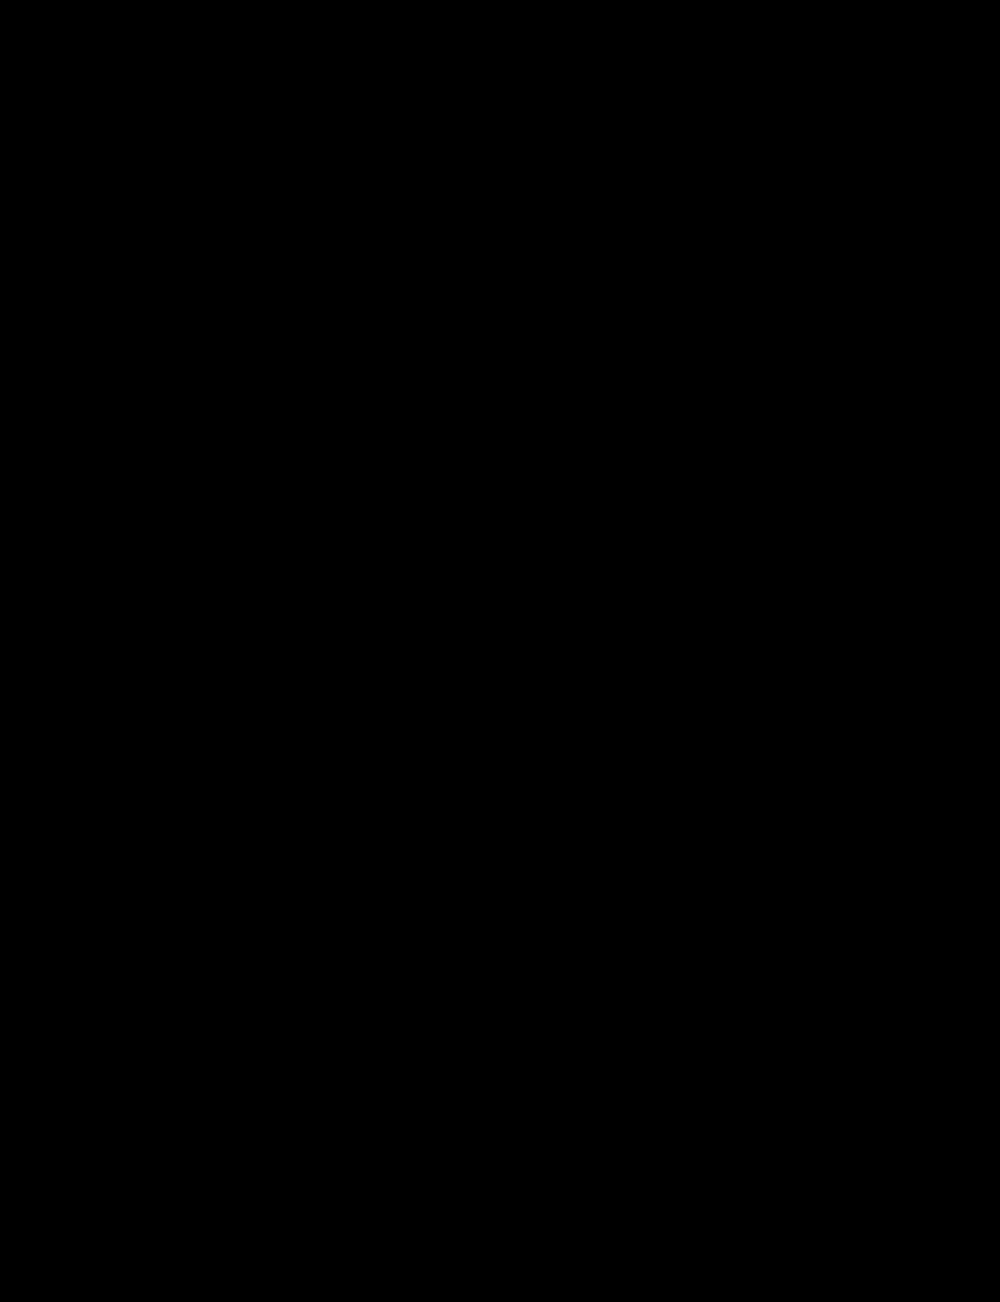 La coupe mi-longue ondulée d'Intermède